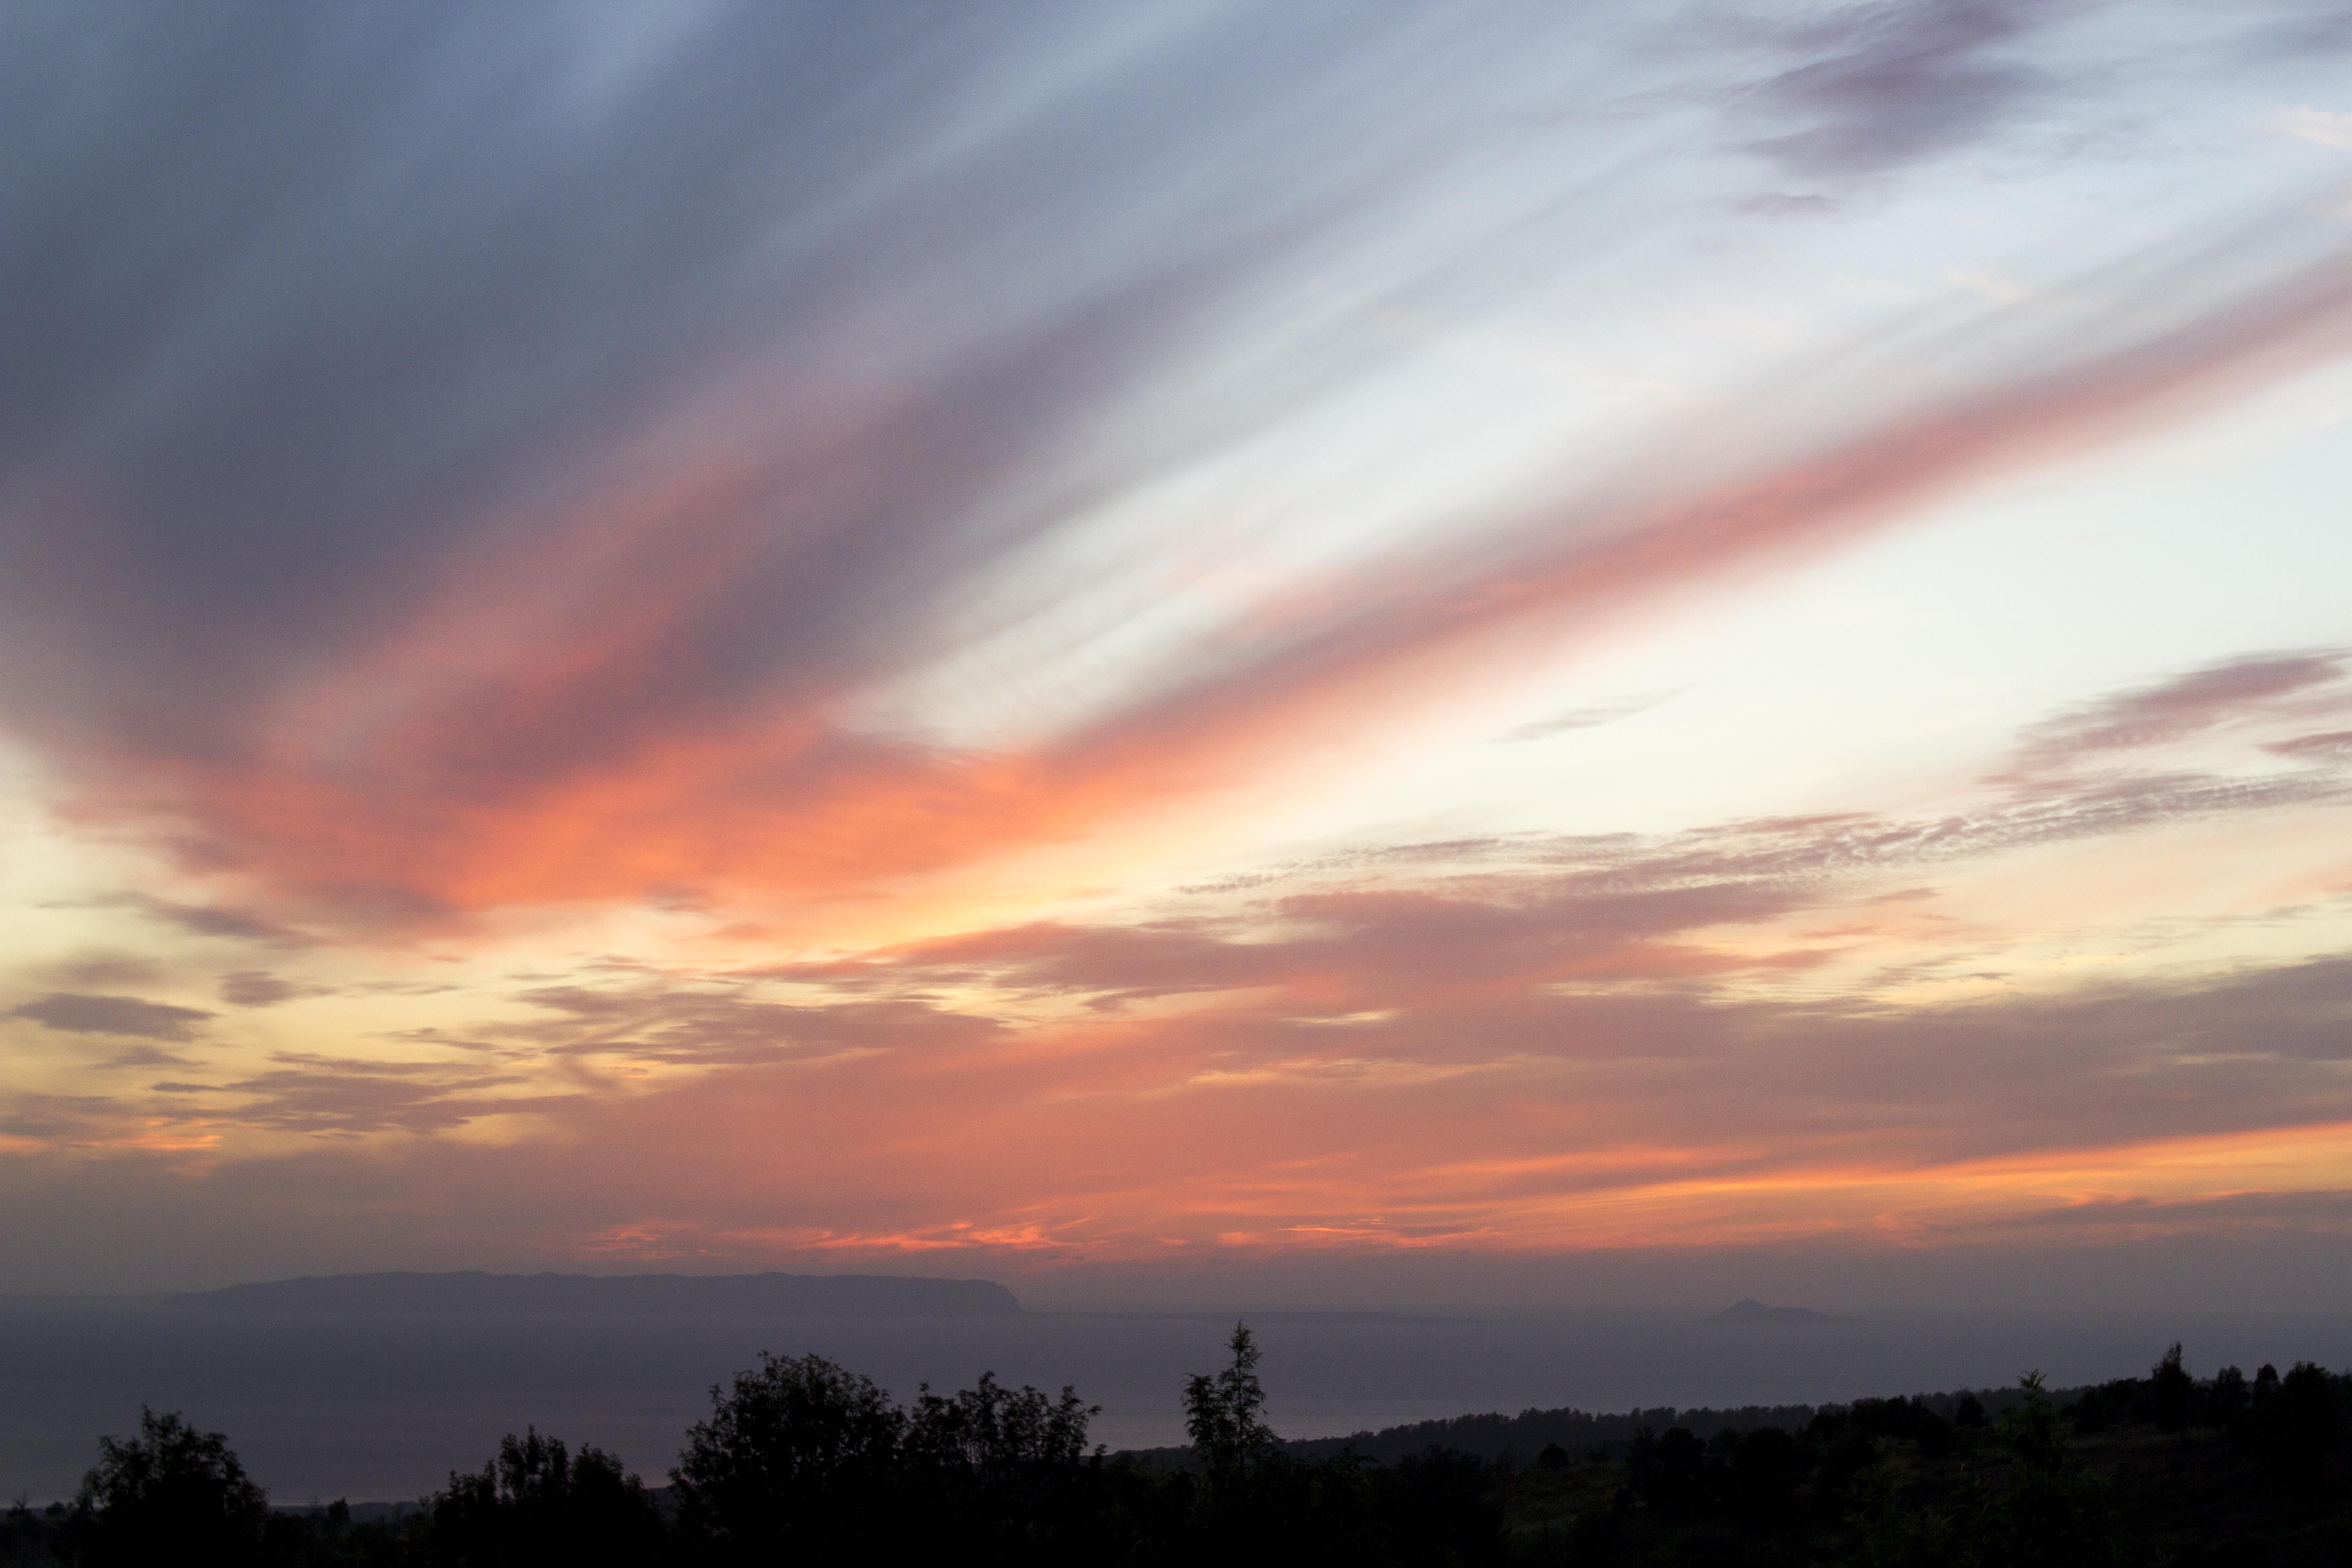 Sunset over Ni'ihau island on Kaua'i